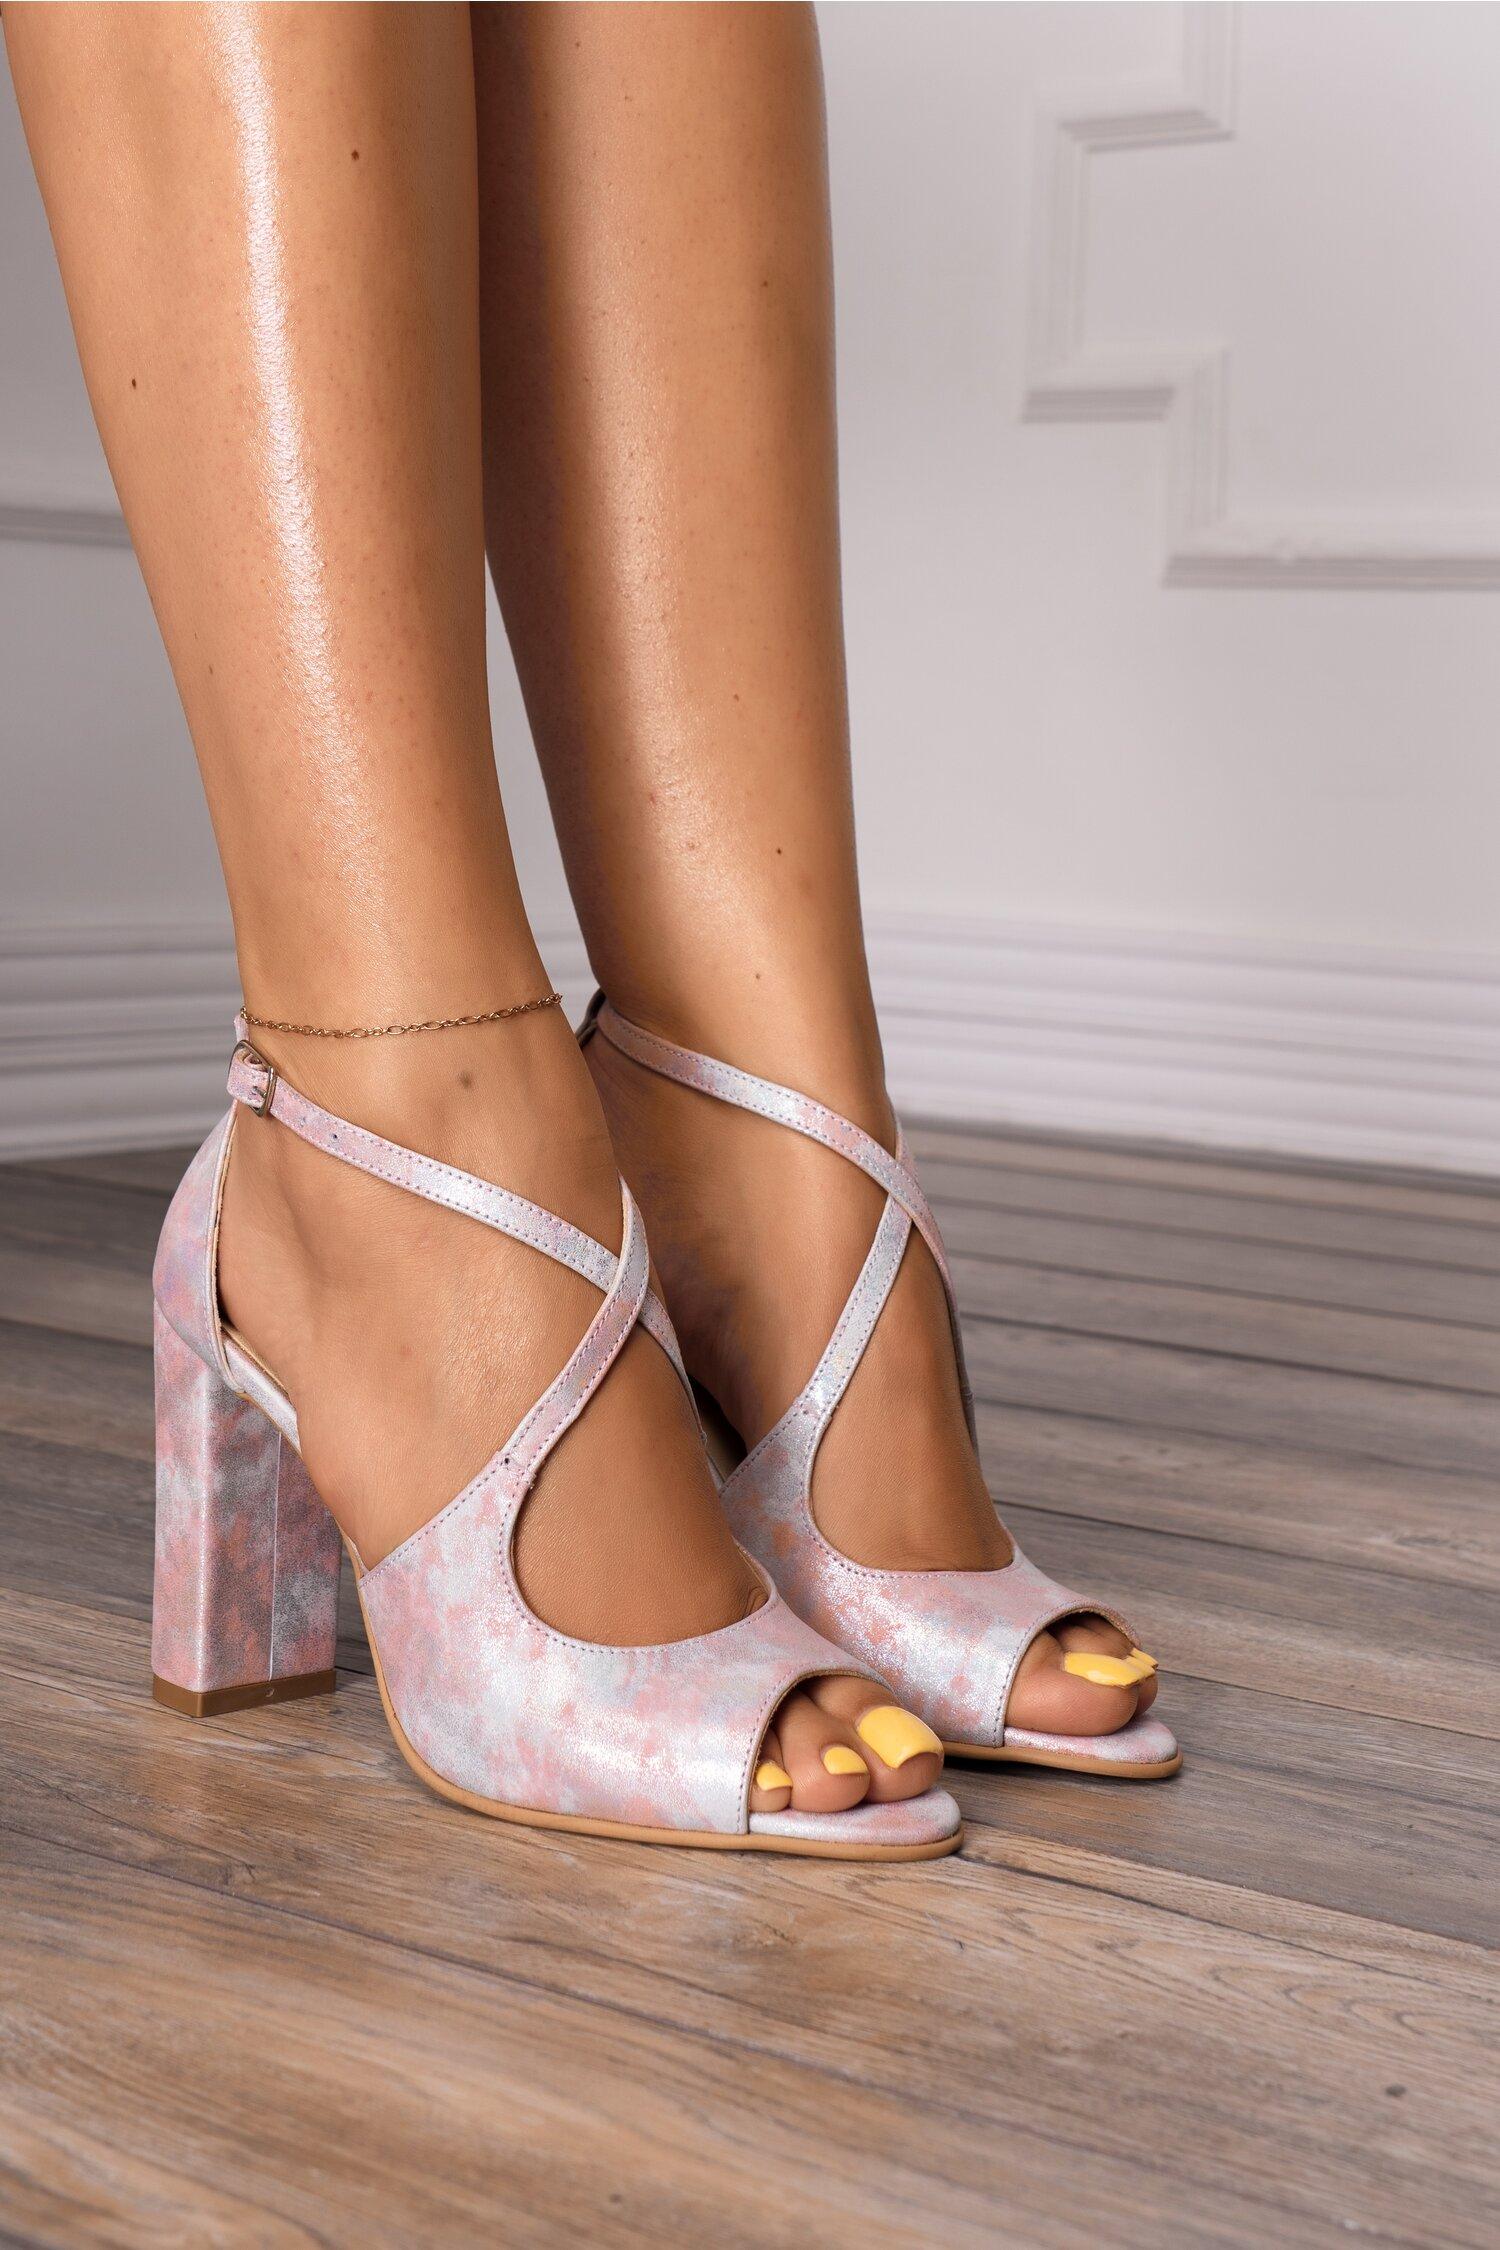 Sandale cu imprimeu pastelat si barete incrucisate imagine